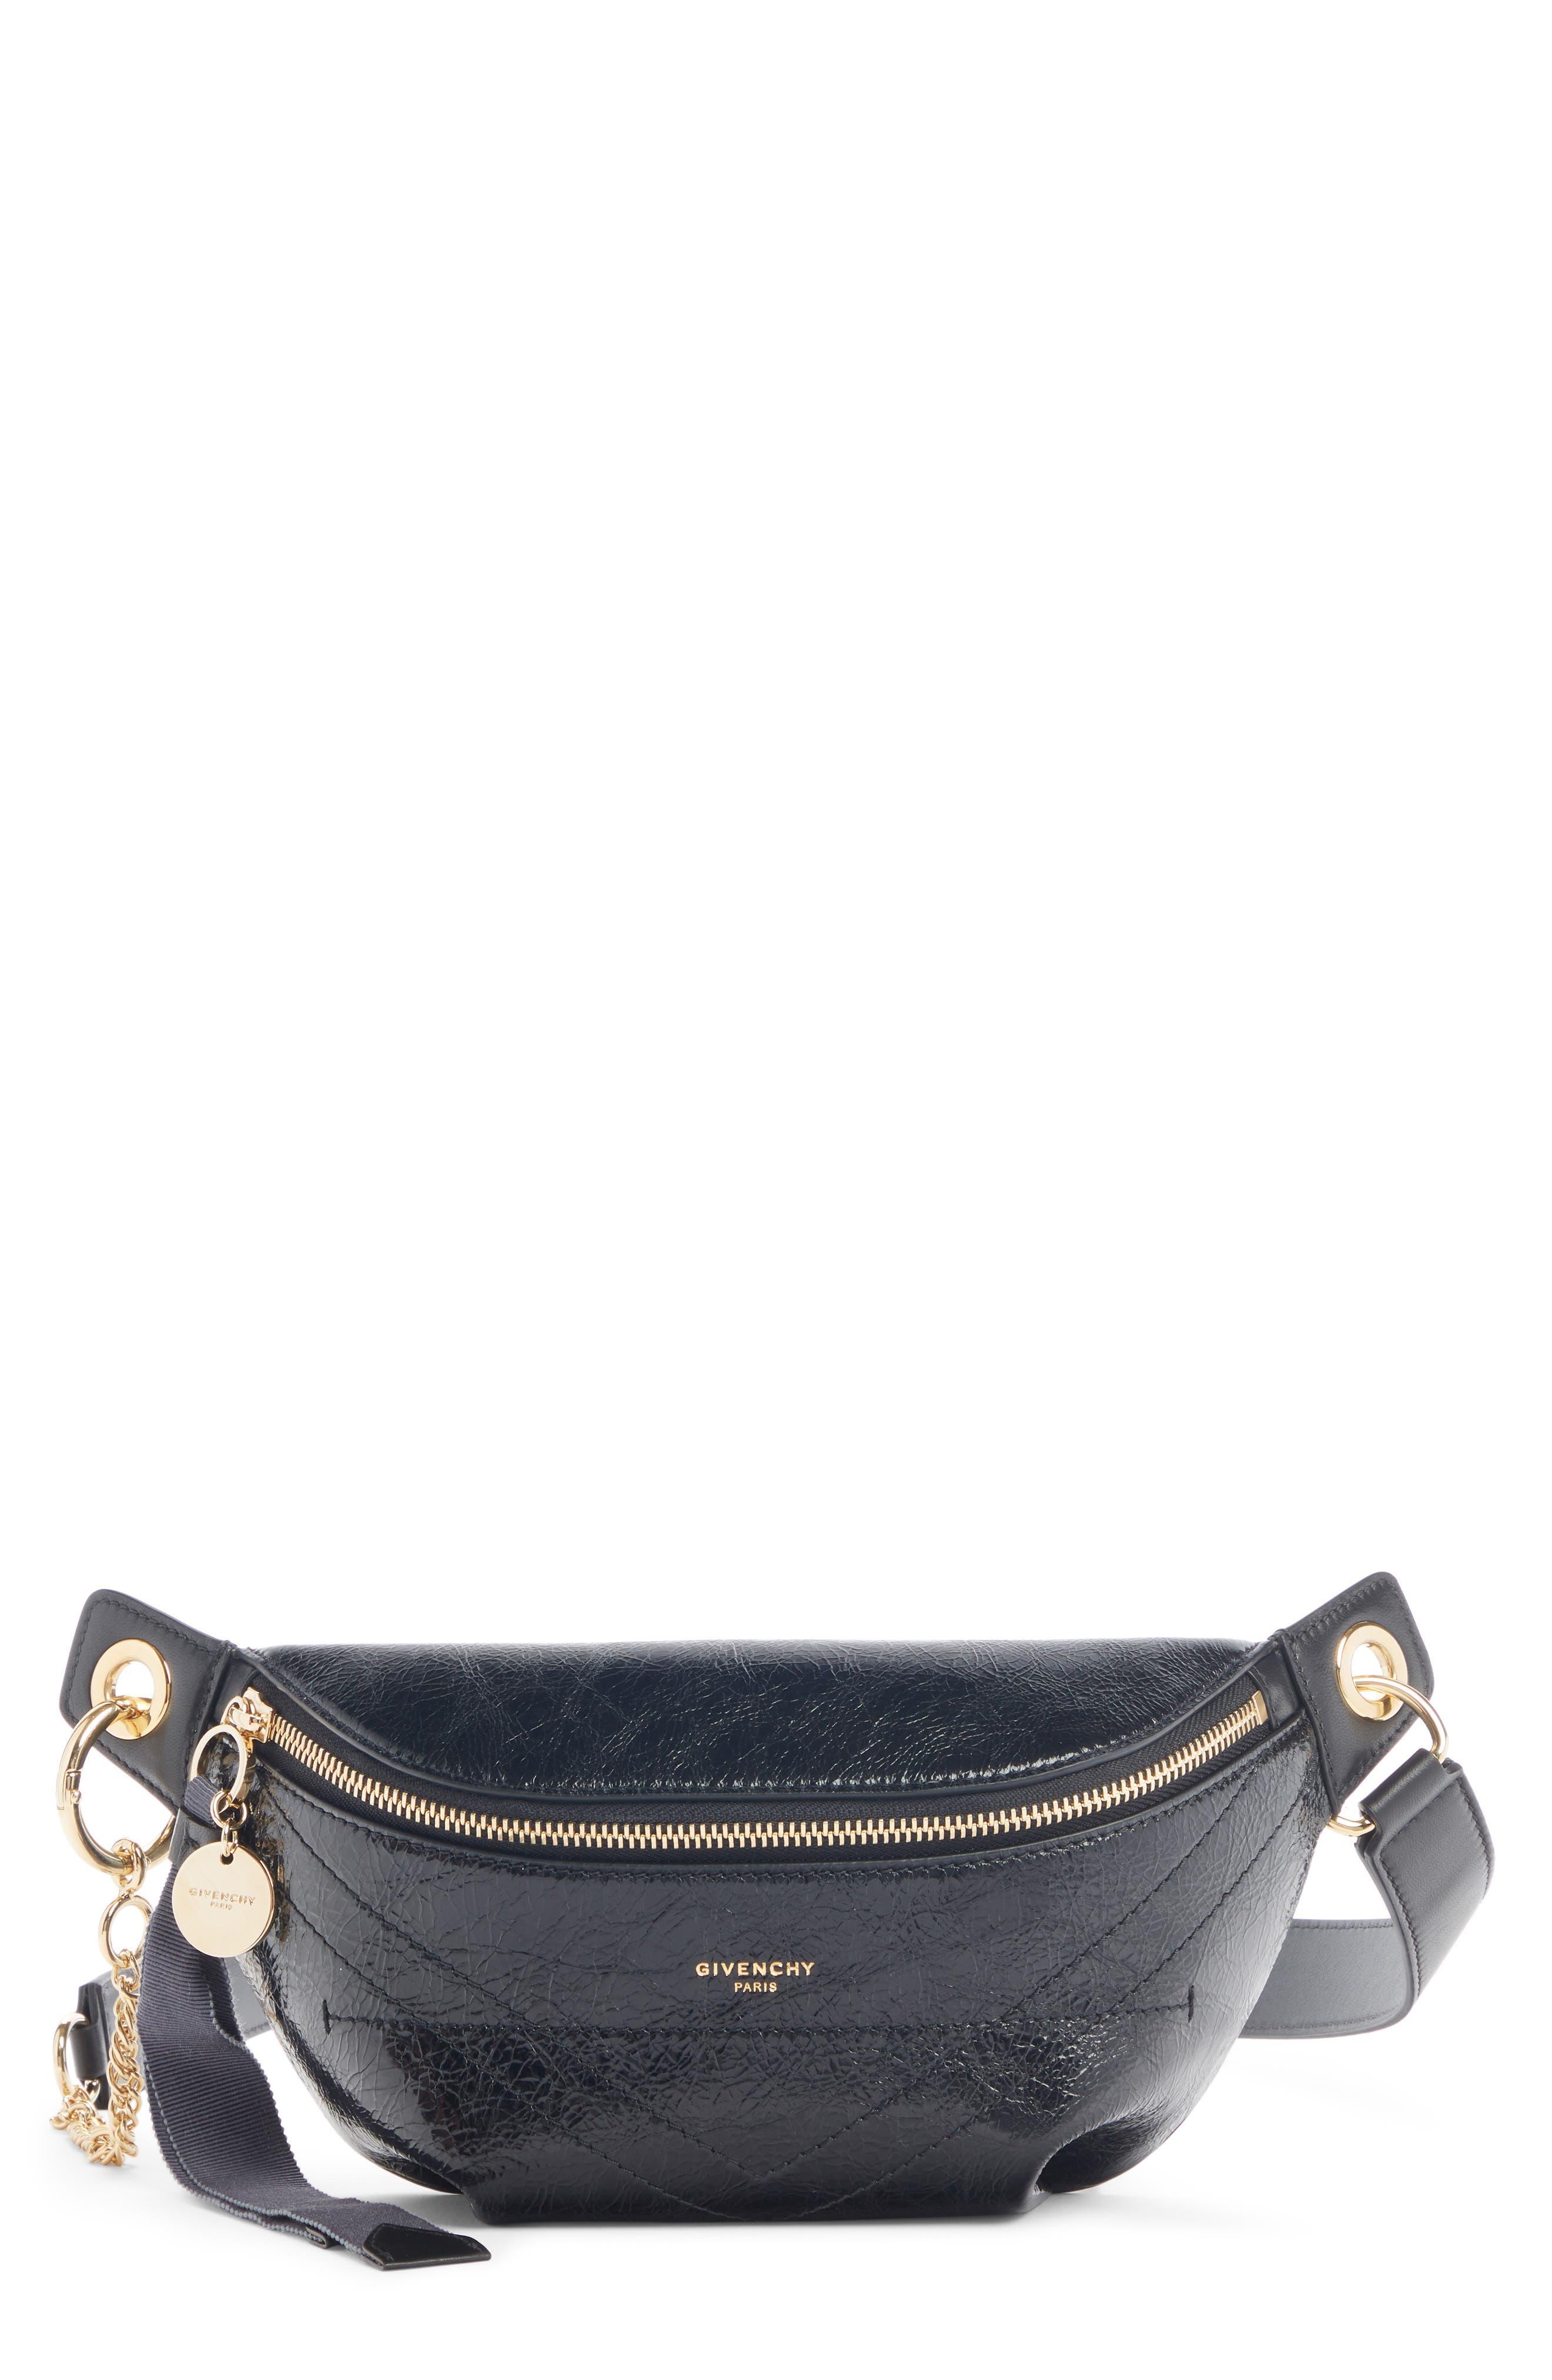 Womens Clear Waist Belt Bag Fanny Pack Phone Card Wallet Mini Dress Pants Decor